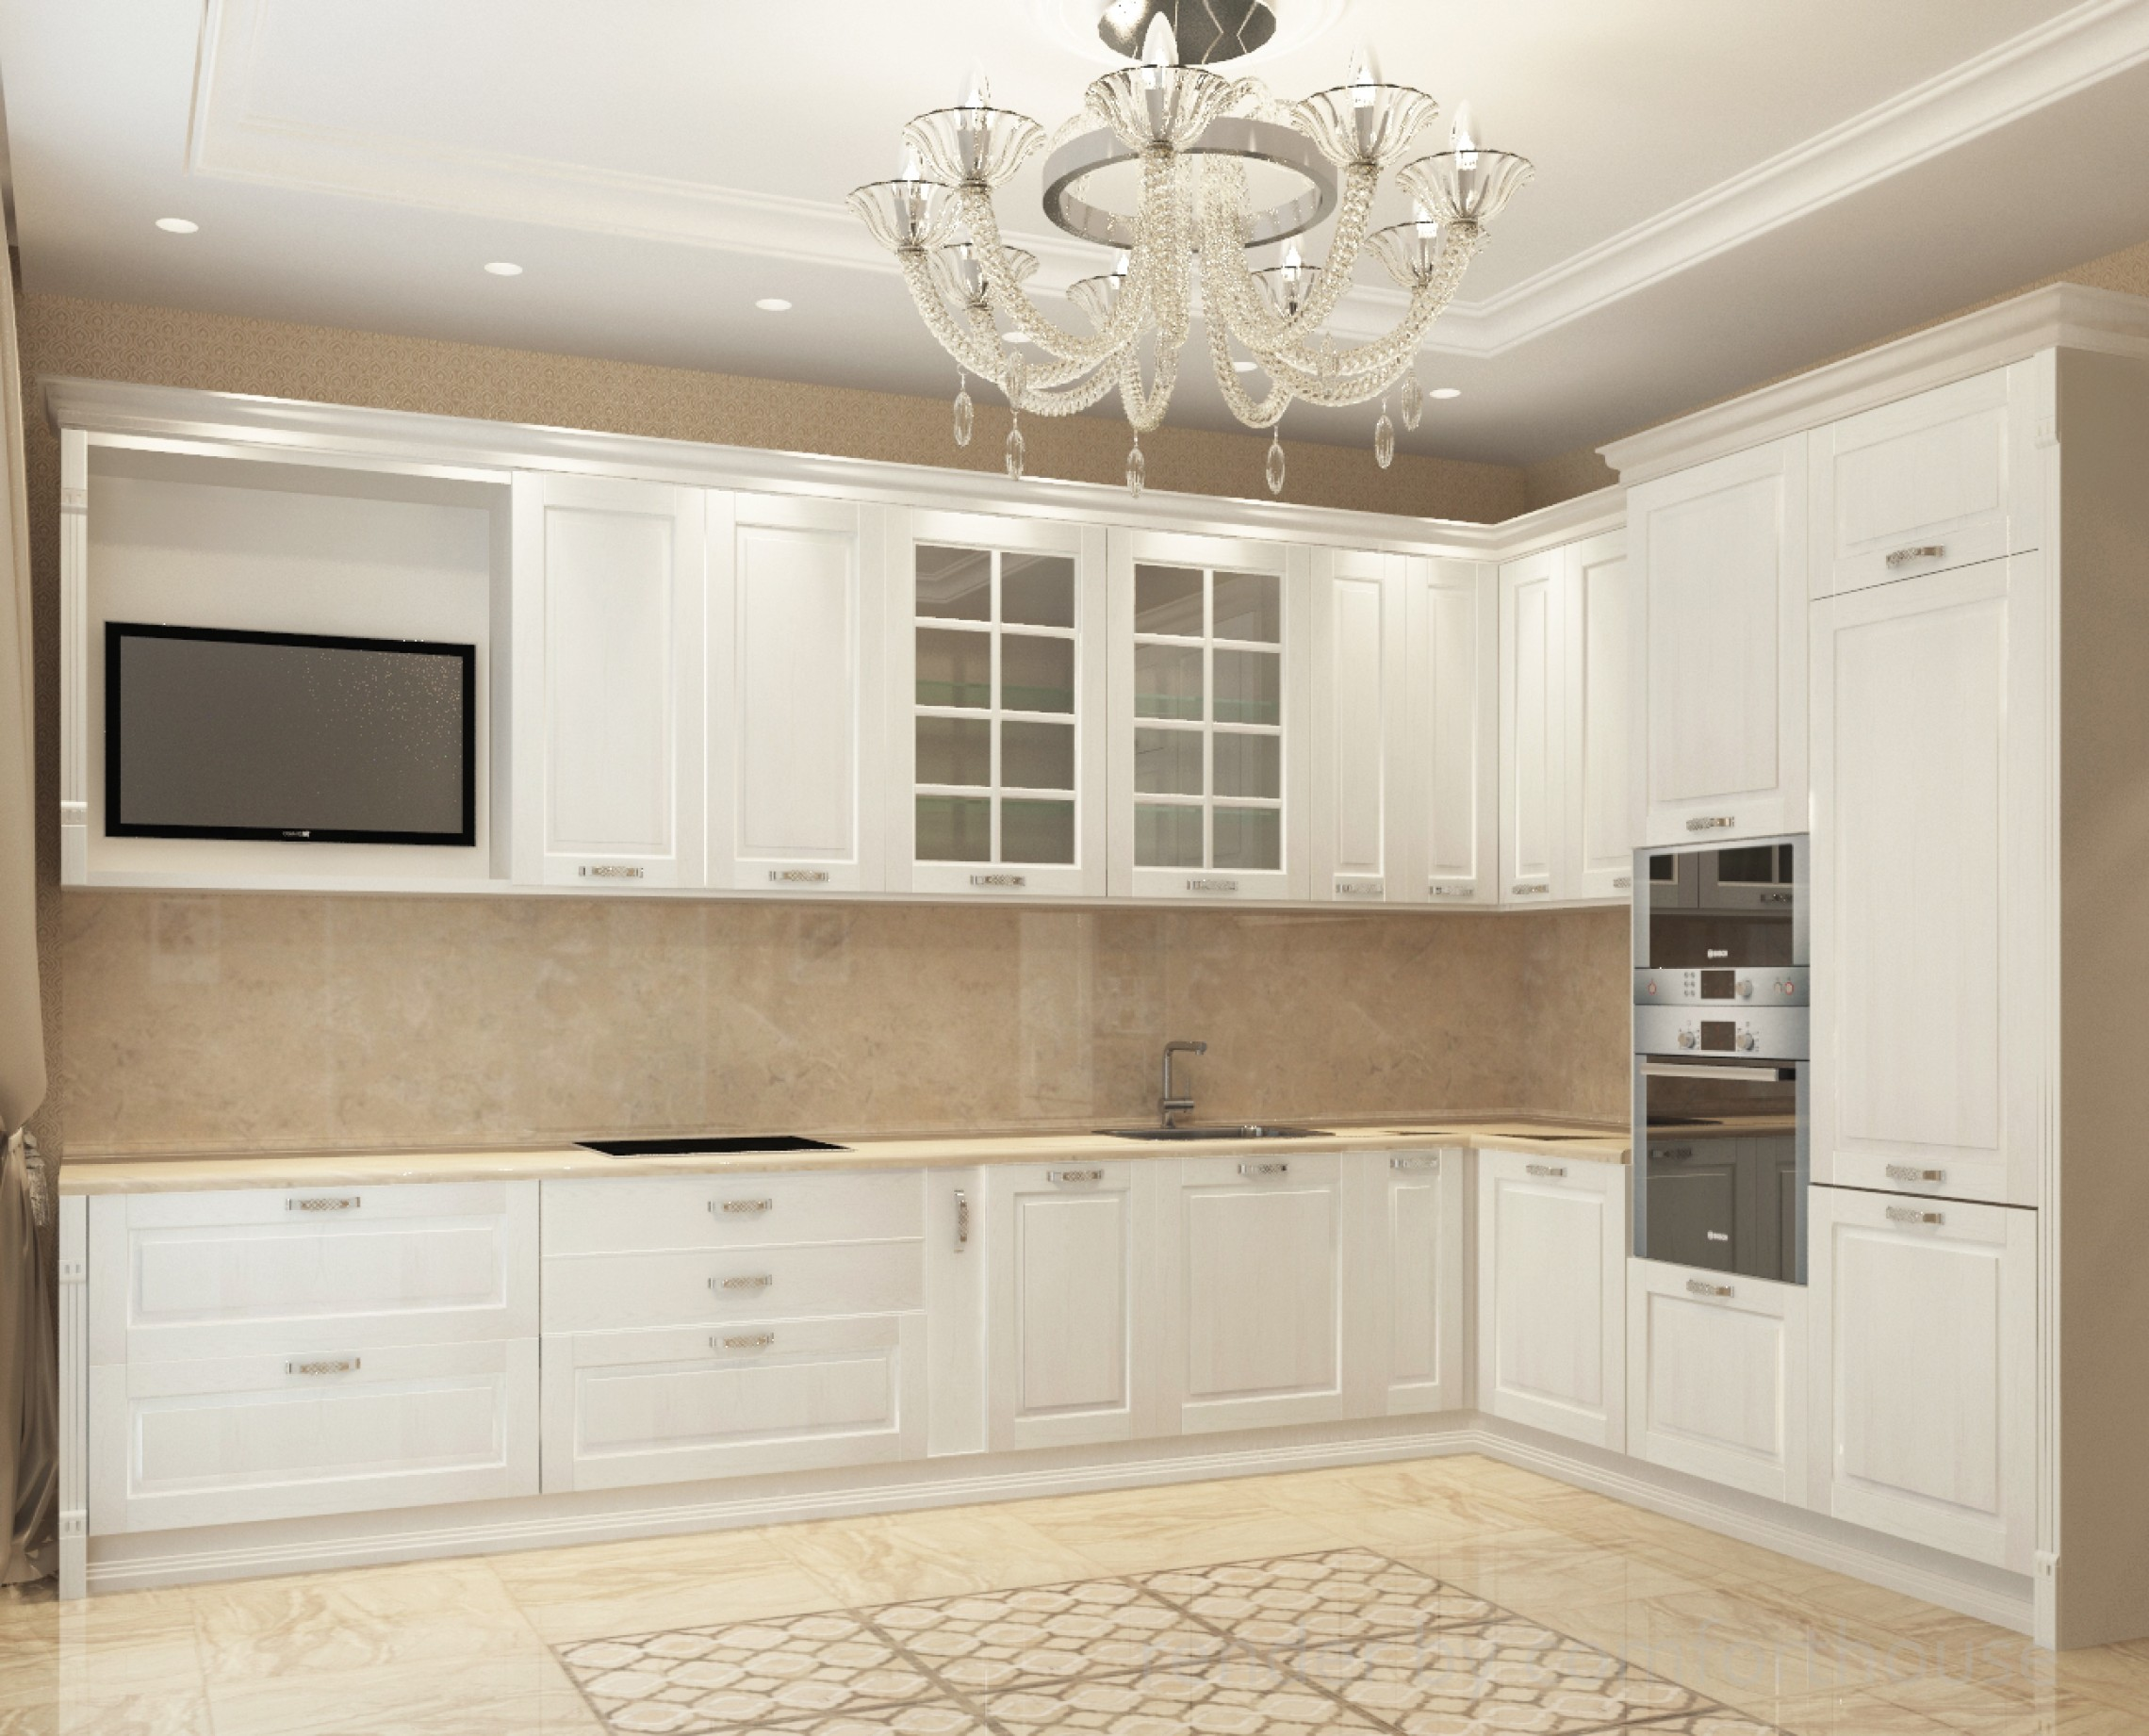 classic interior kitchen